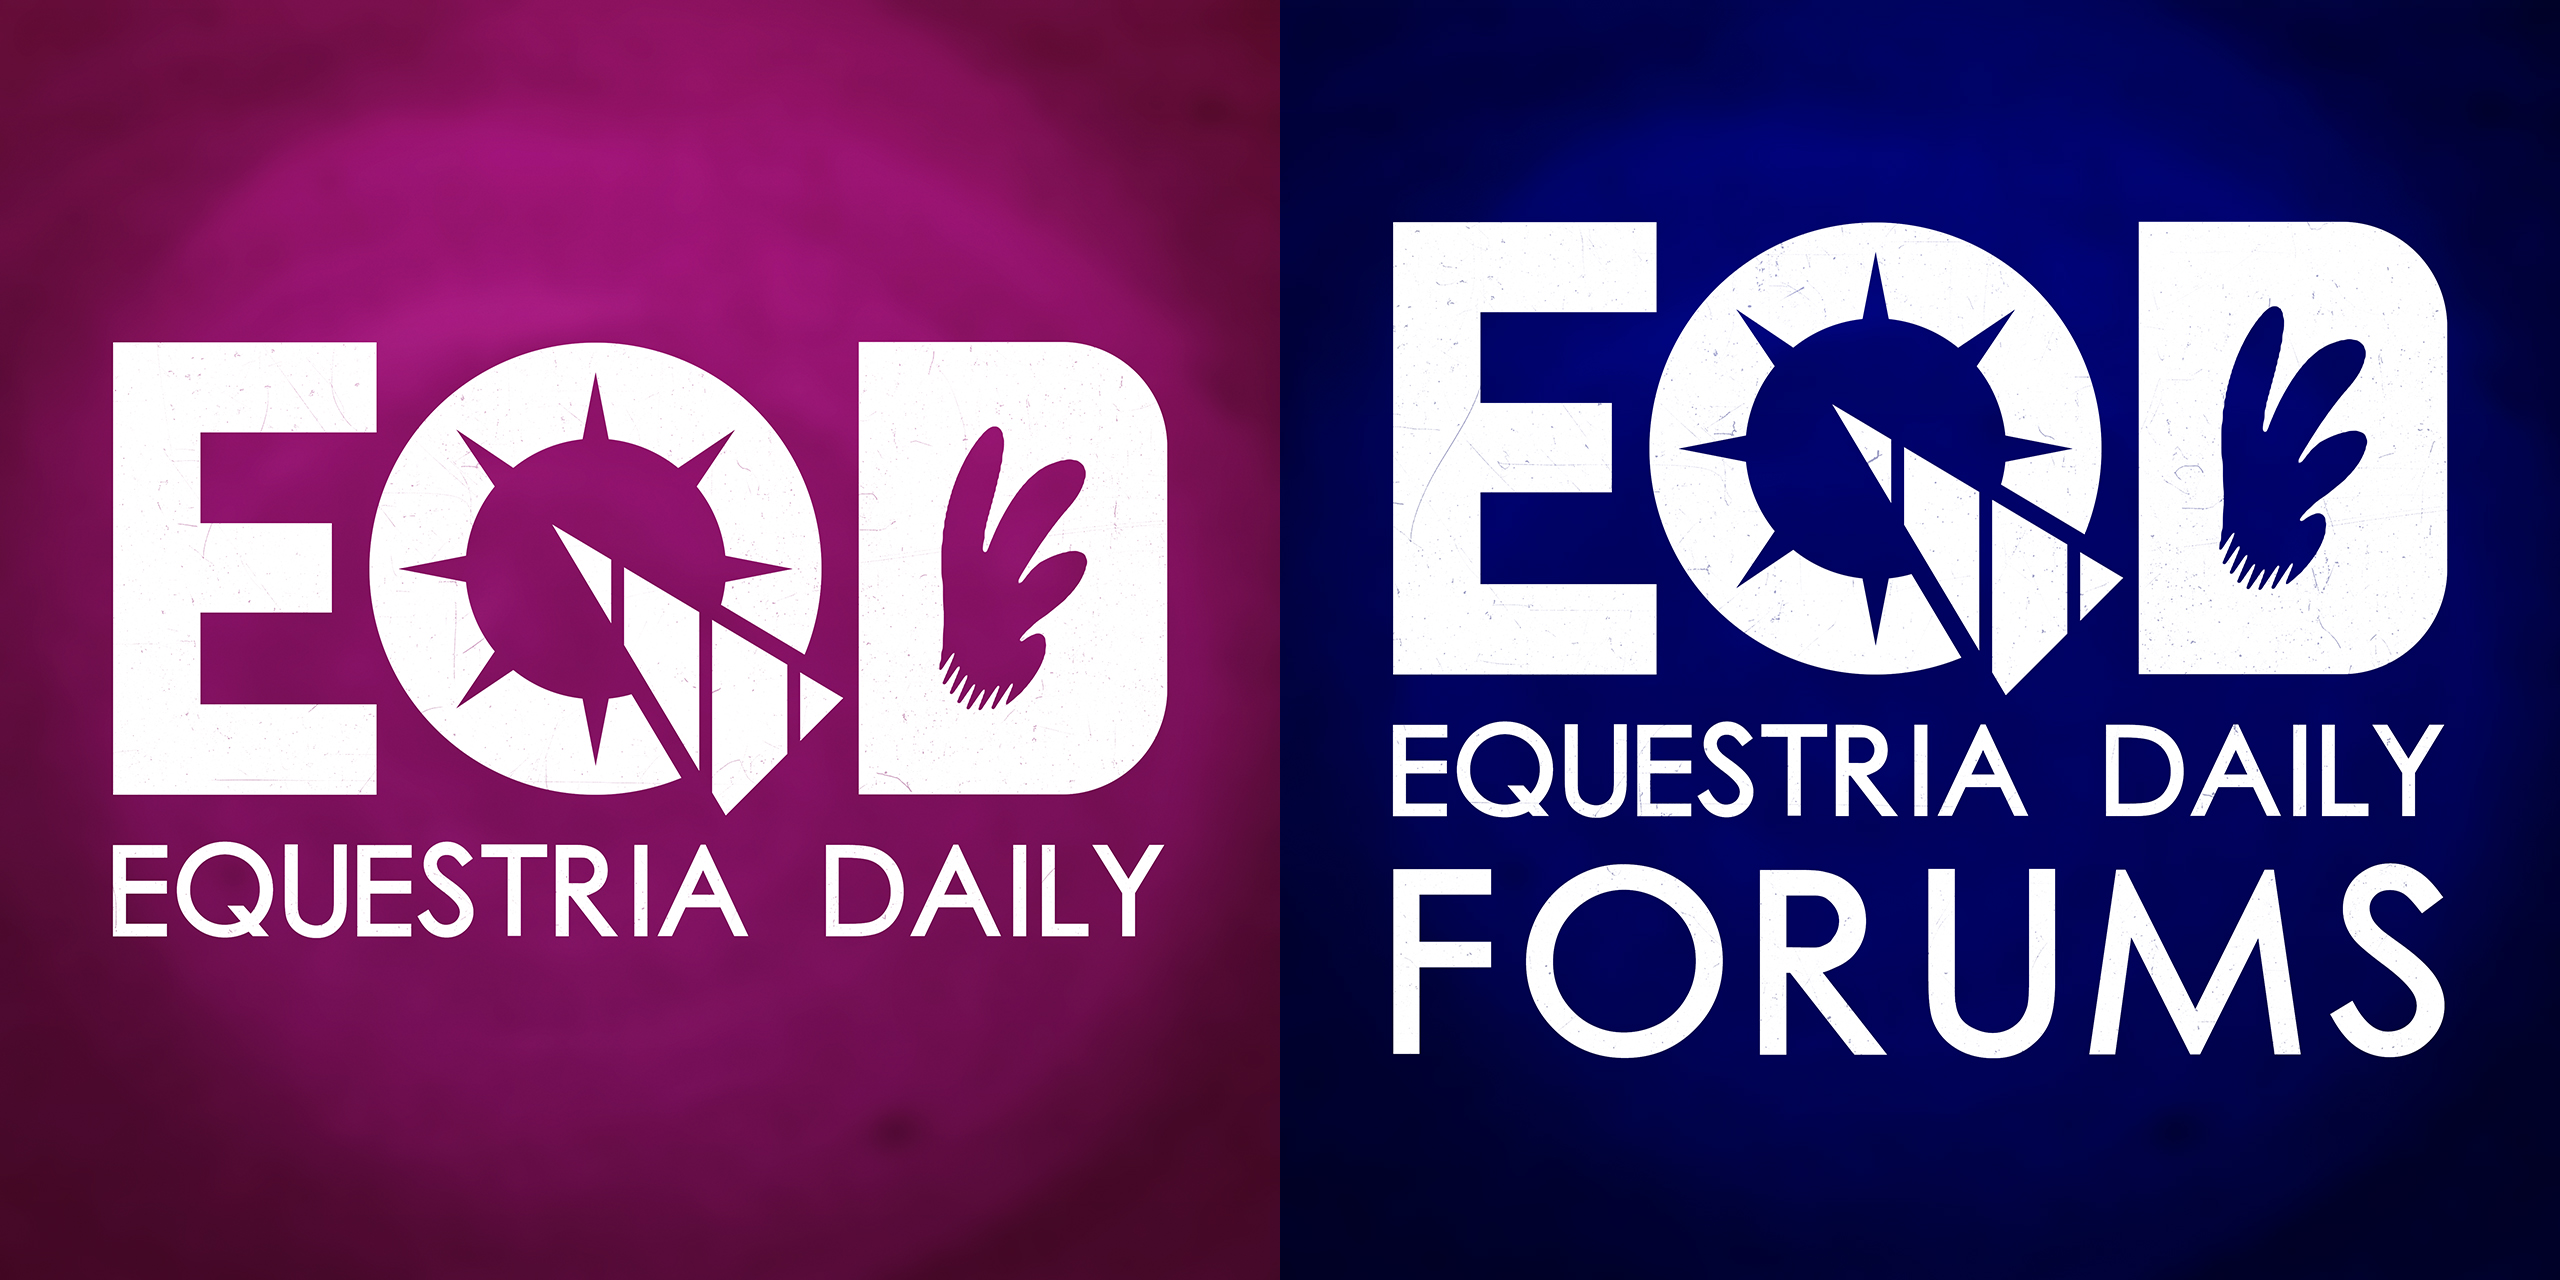 Equestria Daily Logos - 3780px by dadiocoleman